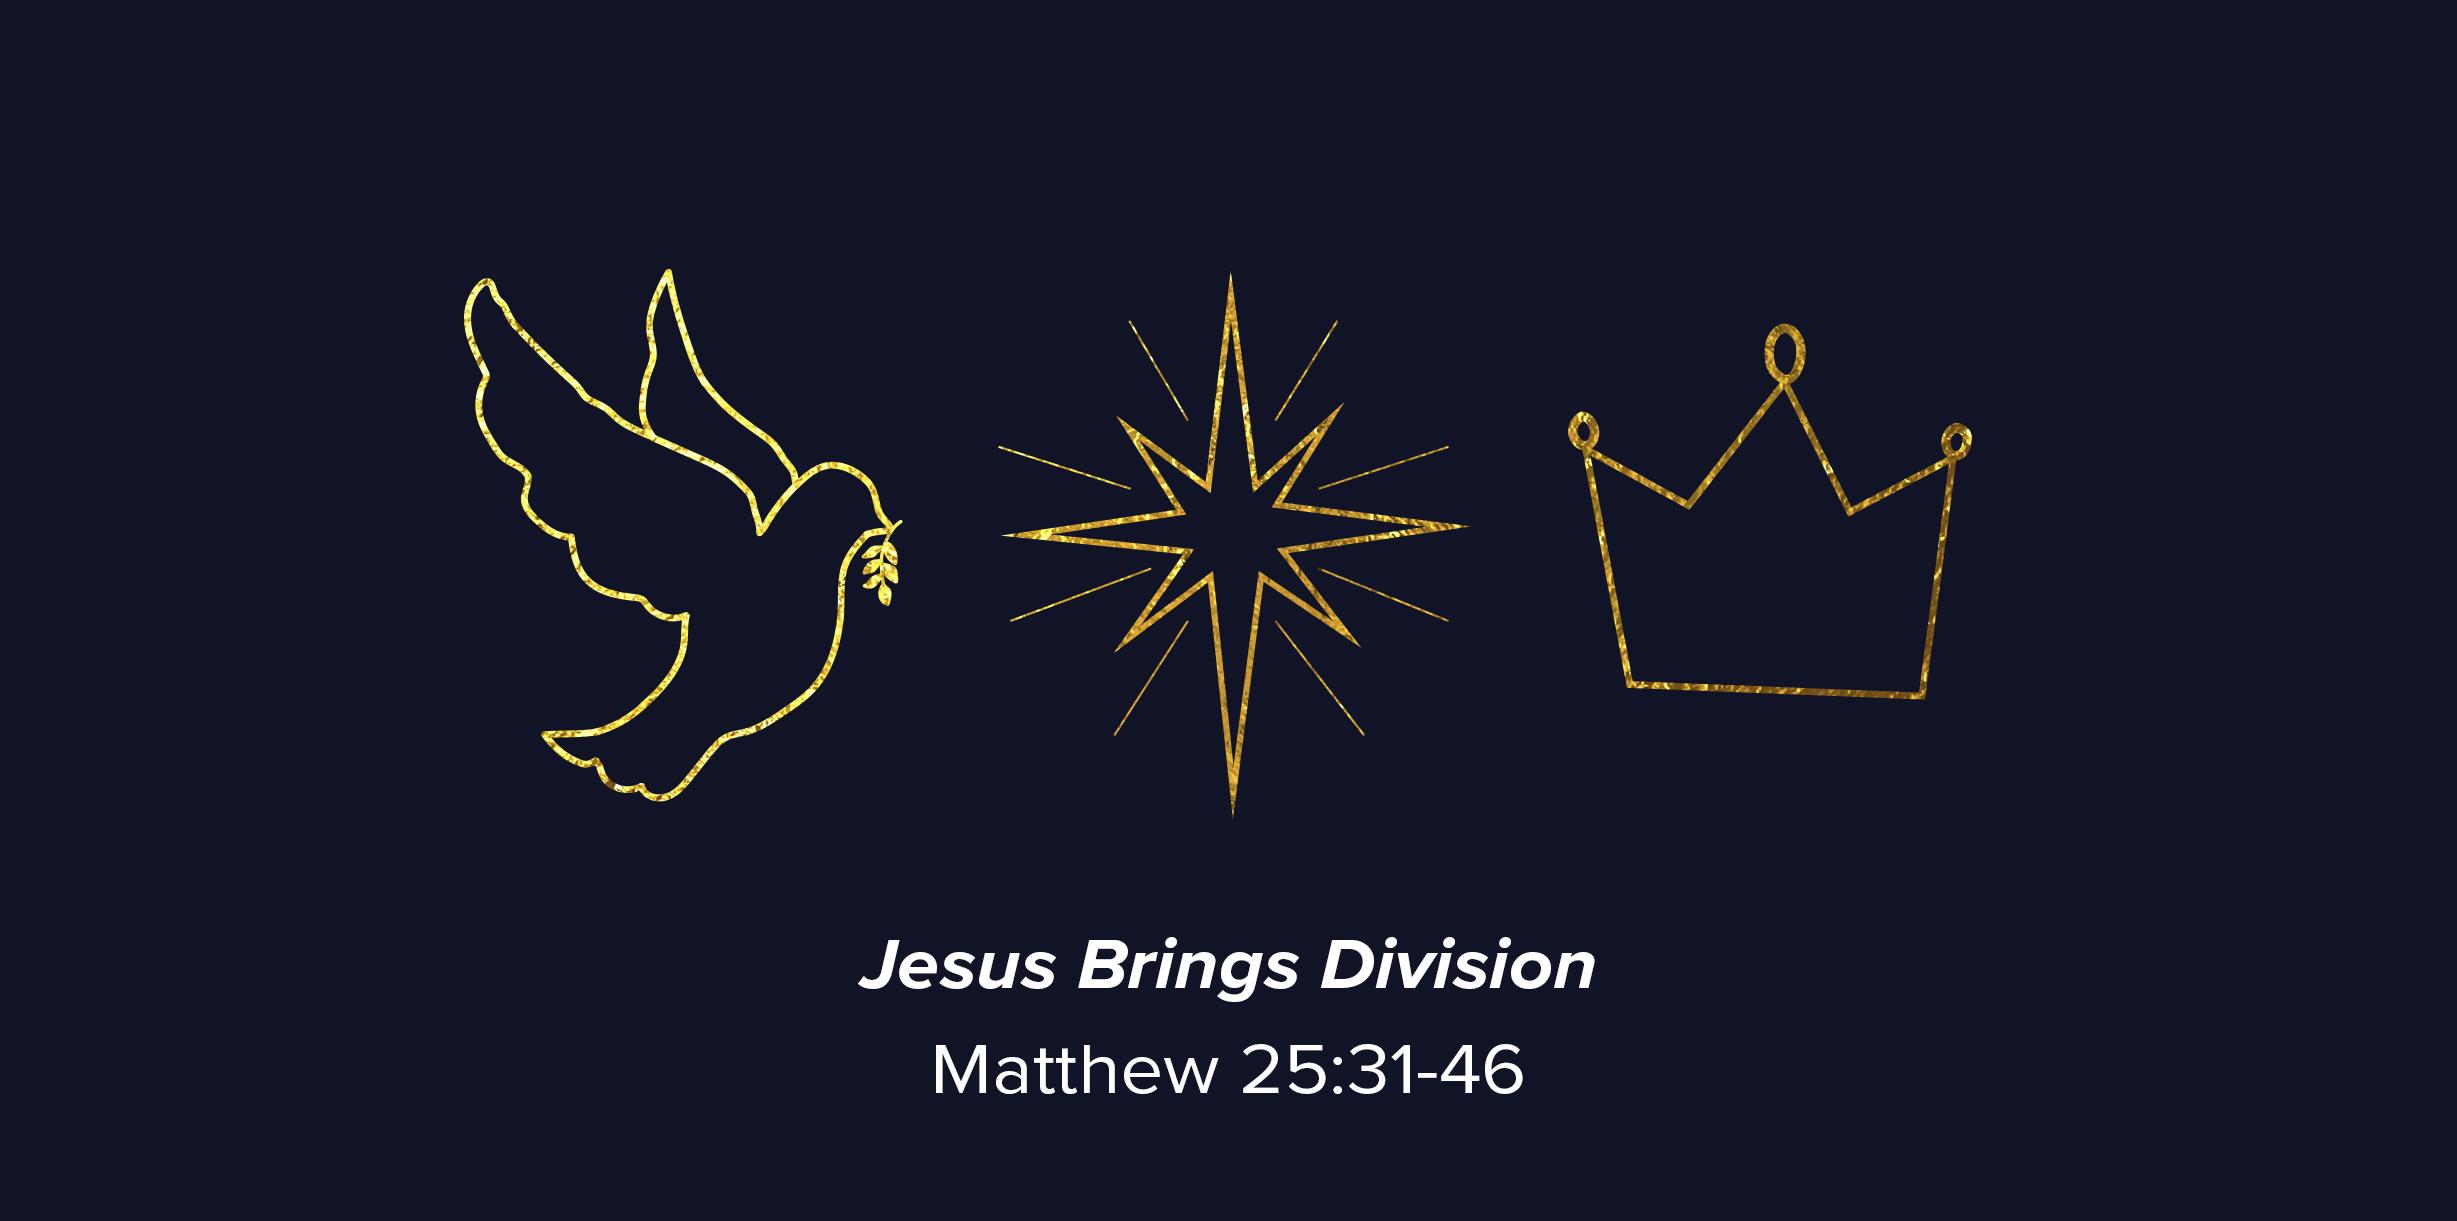 02-JesusBringsDivision-2018.png